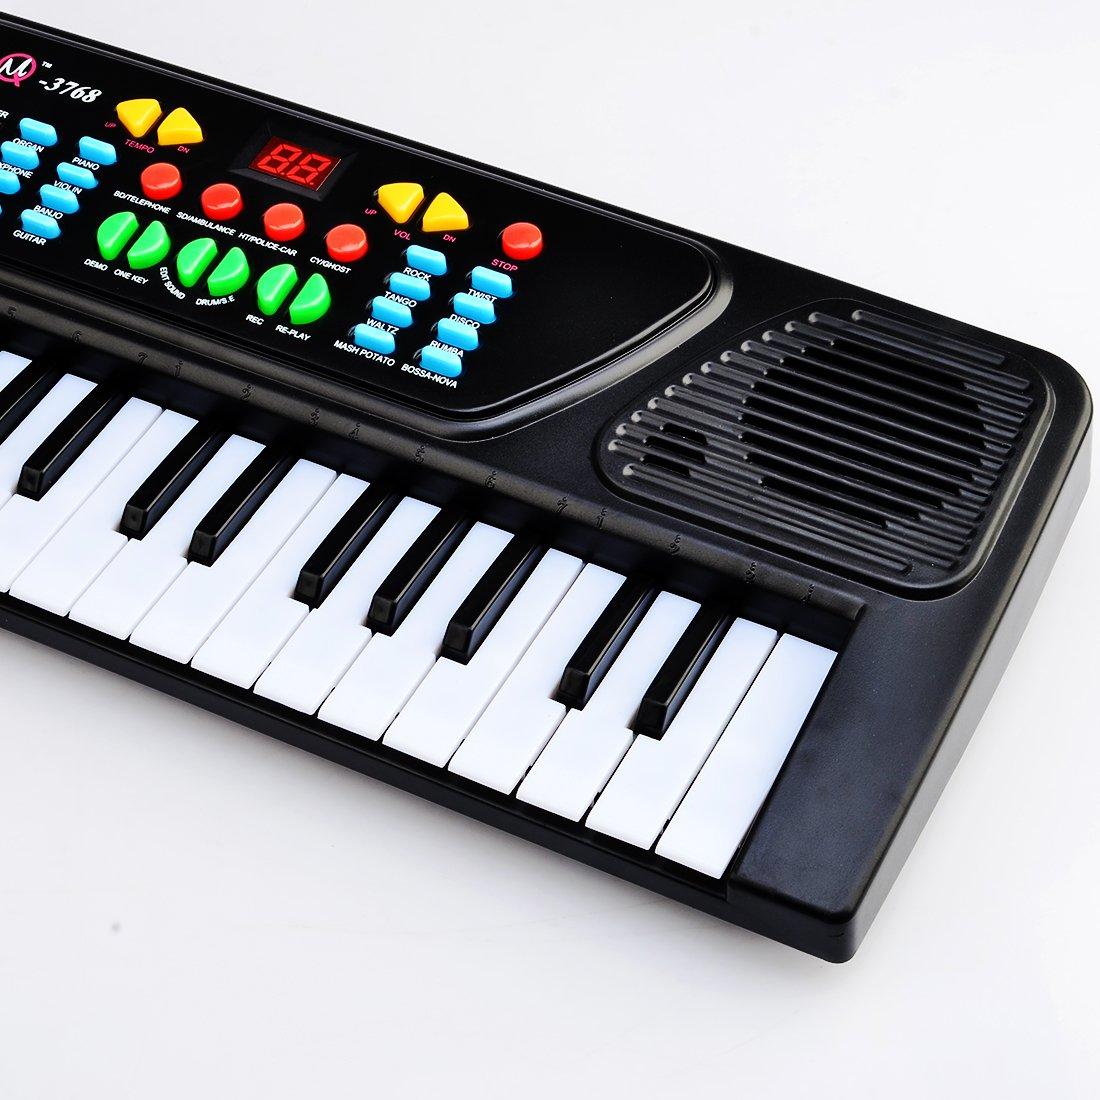 Amazon.com: Electronic Piano Musical Toy, PINCHUANGHUI ABS 16.9 X 6.7 X 2.2 Inch 37 Key Electronic Keyboard Piano Musical Toy for Children 3768 - Black: ...